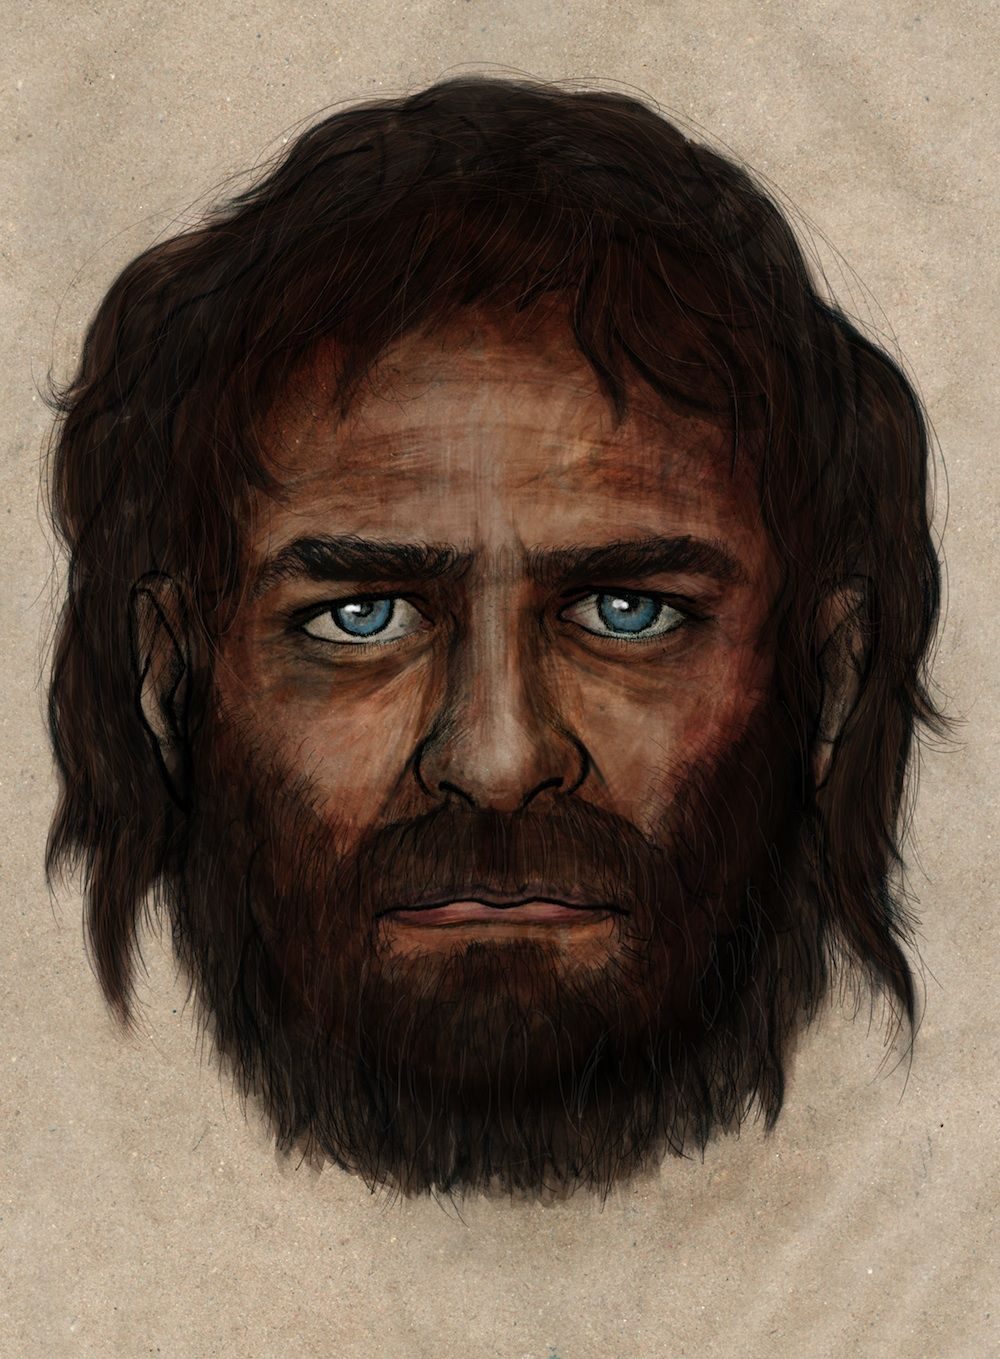 7,000-Year-Old Human Bones Suggest New Date for Light-Skin Gene